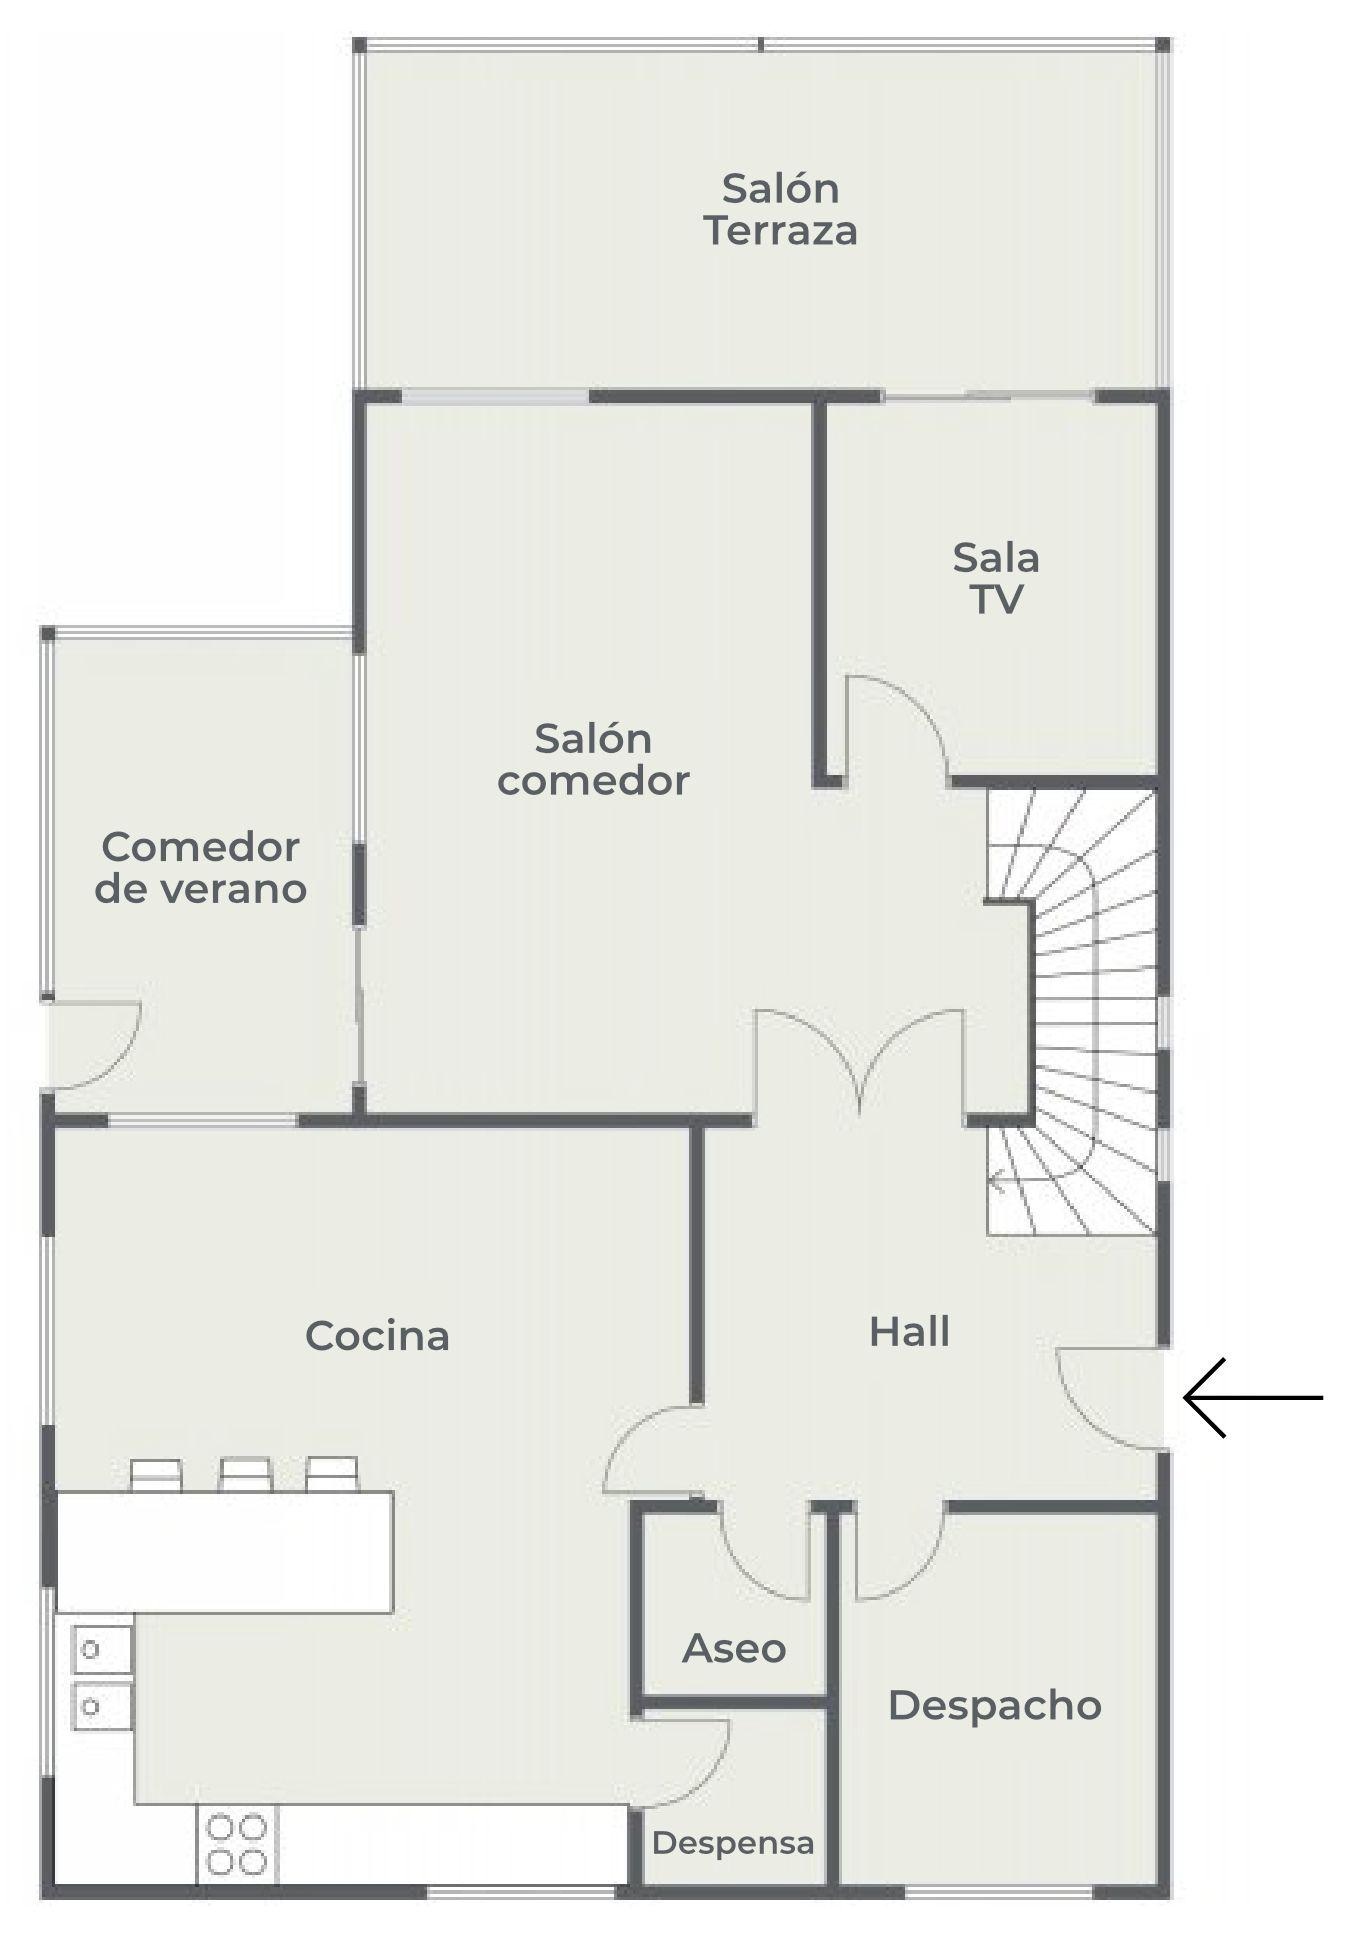 La Casa Azul - Tegueste. Plano de planta. Planta baja